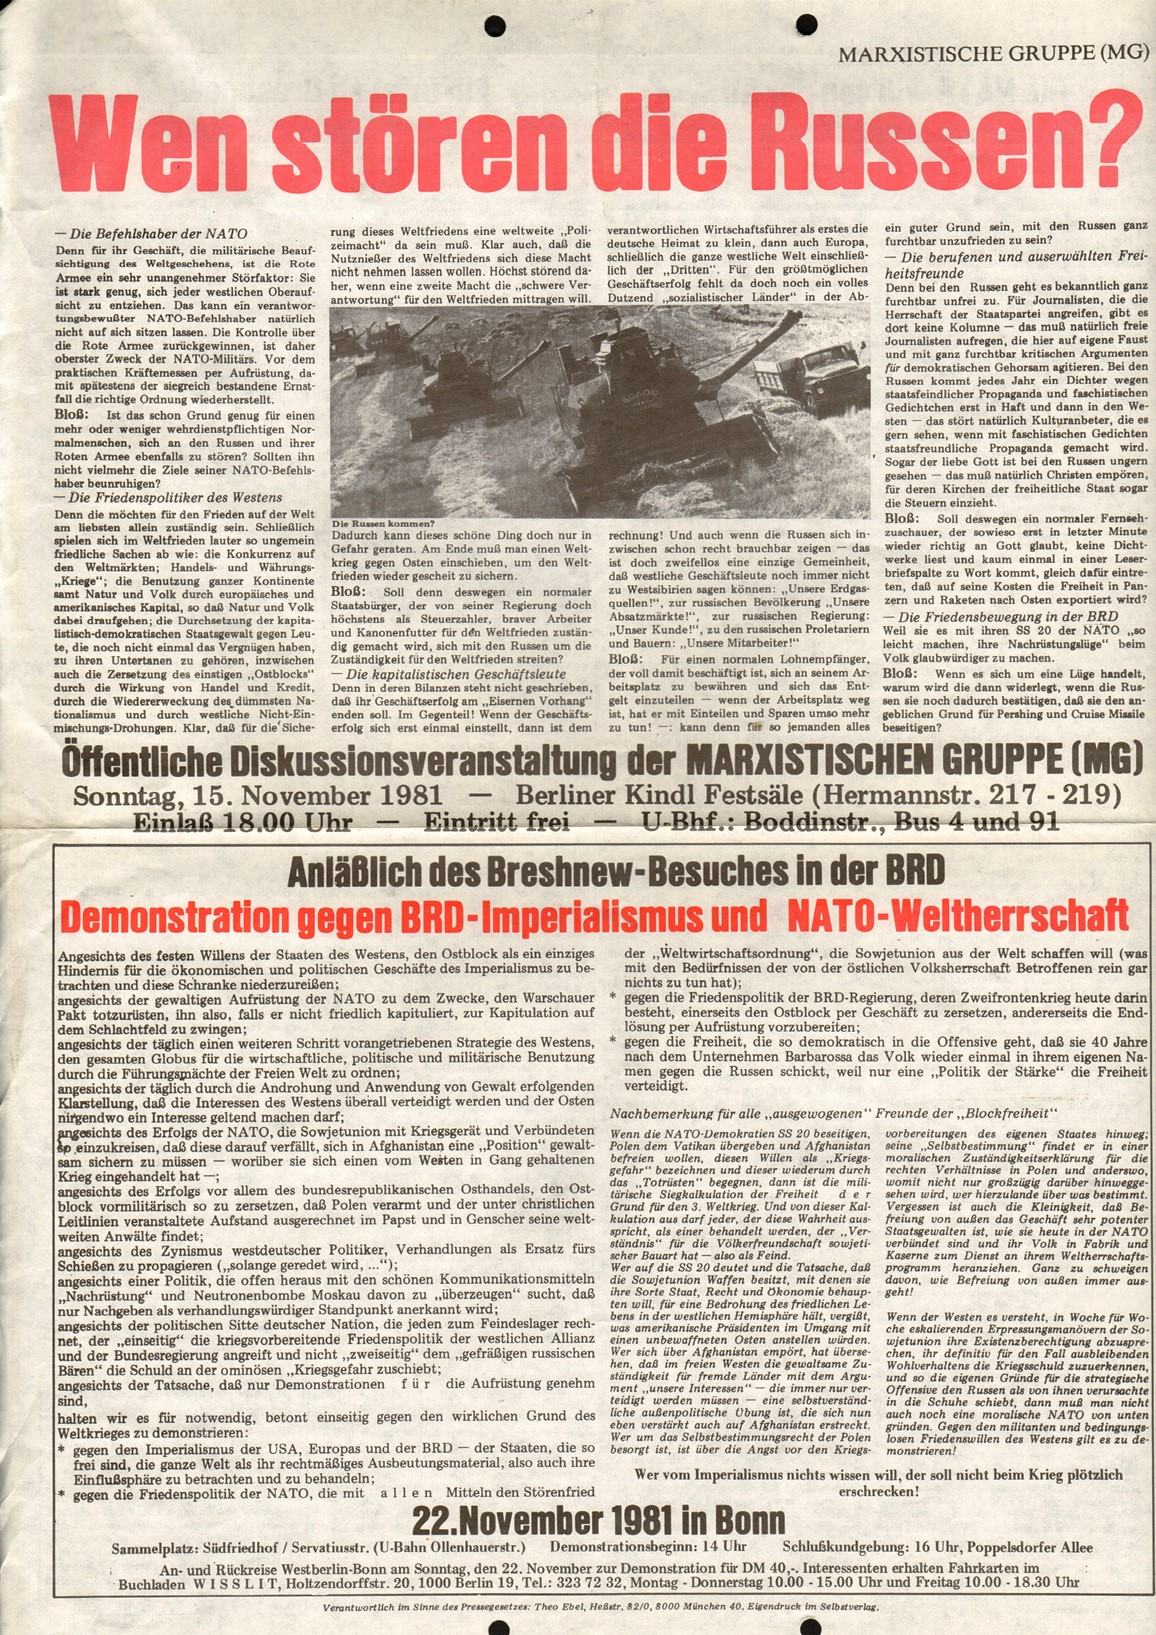 Berlin_MG_FB_19811112_01